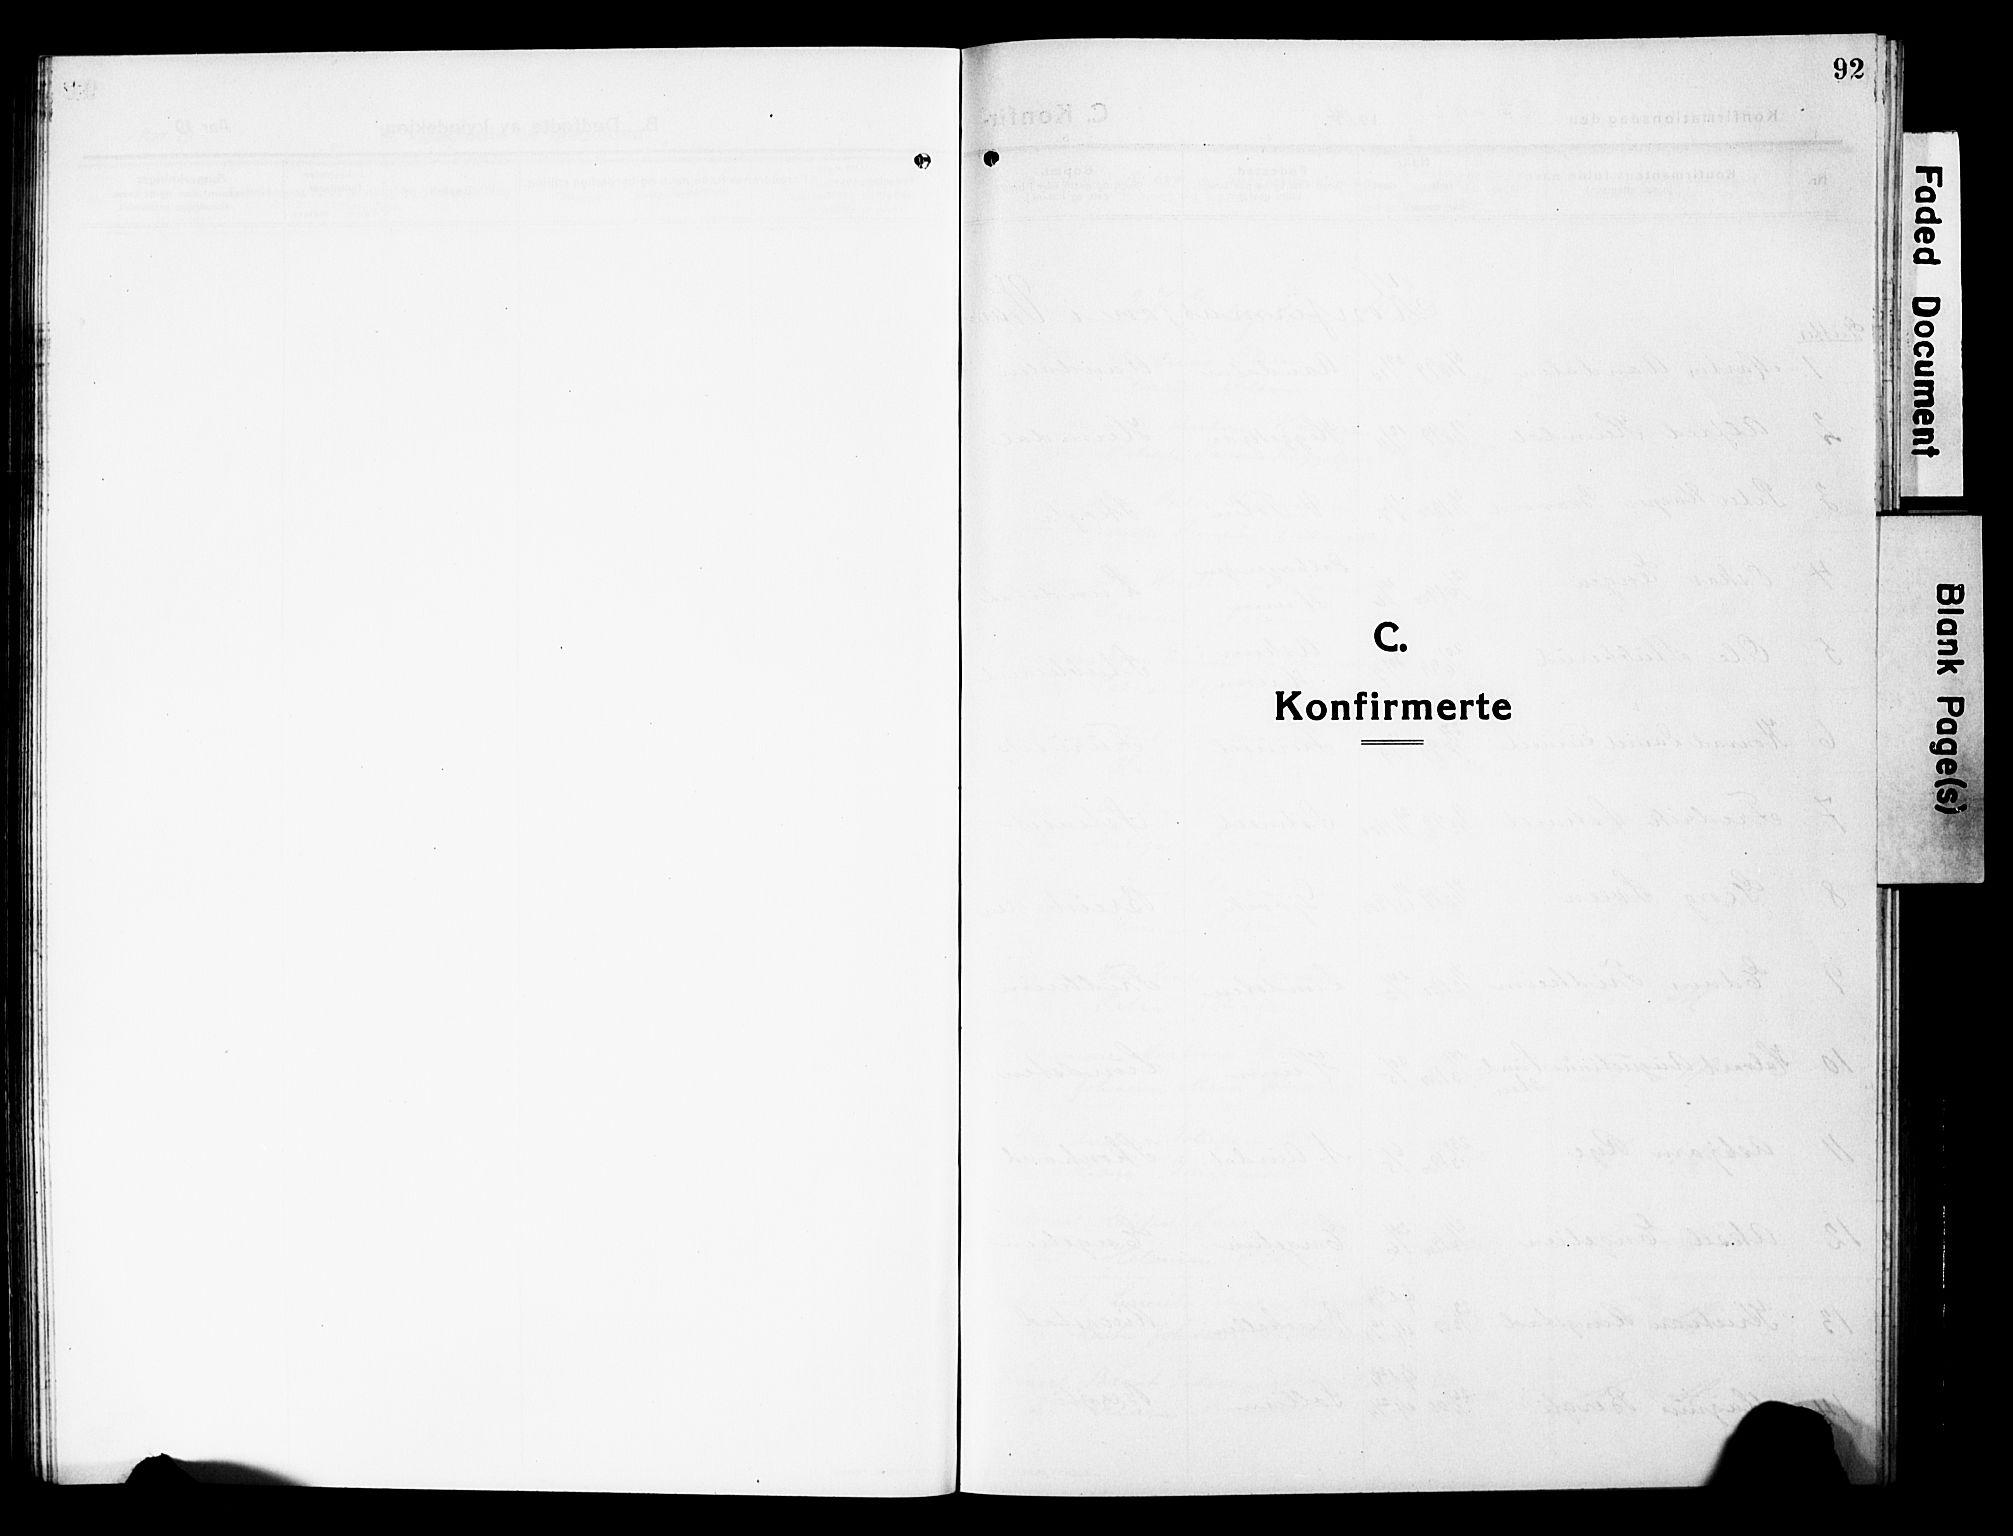 SAH, Vardal prestekontor, H/Ha/Hab/L0015: Klokkerbok nr. 15, 1914-1931, s. 92